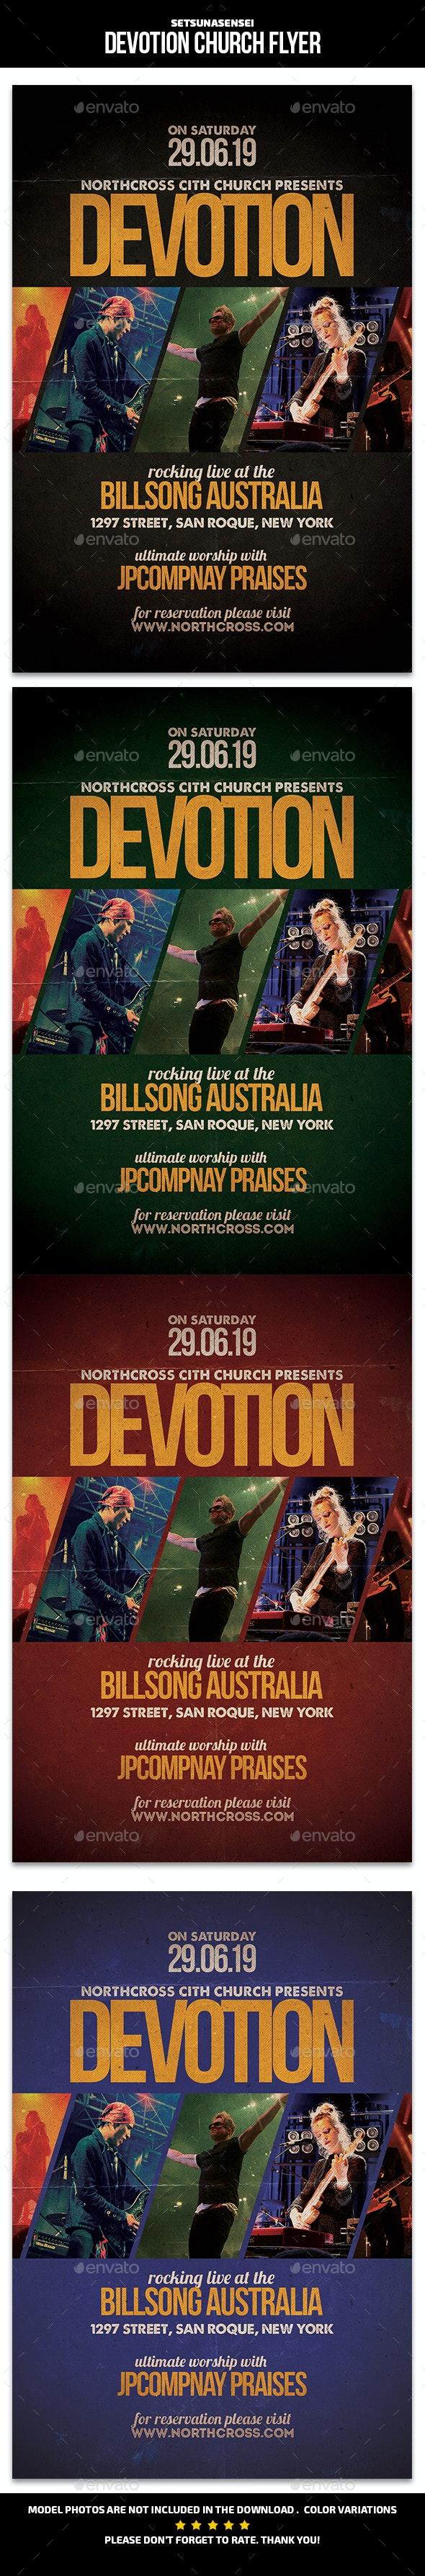 Devotion Church Flyer - Church Flyers